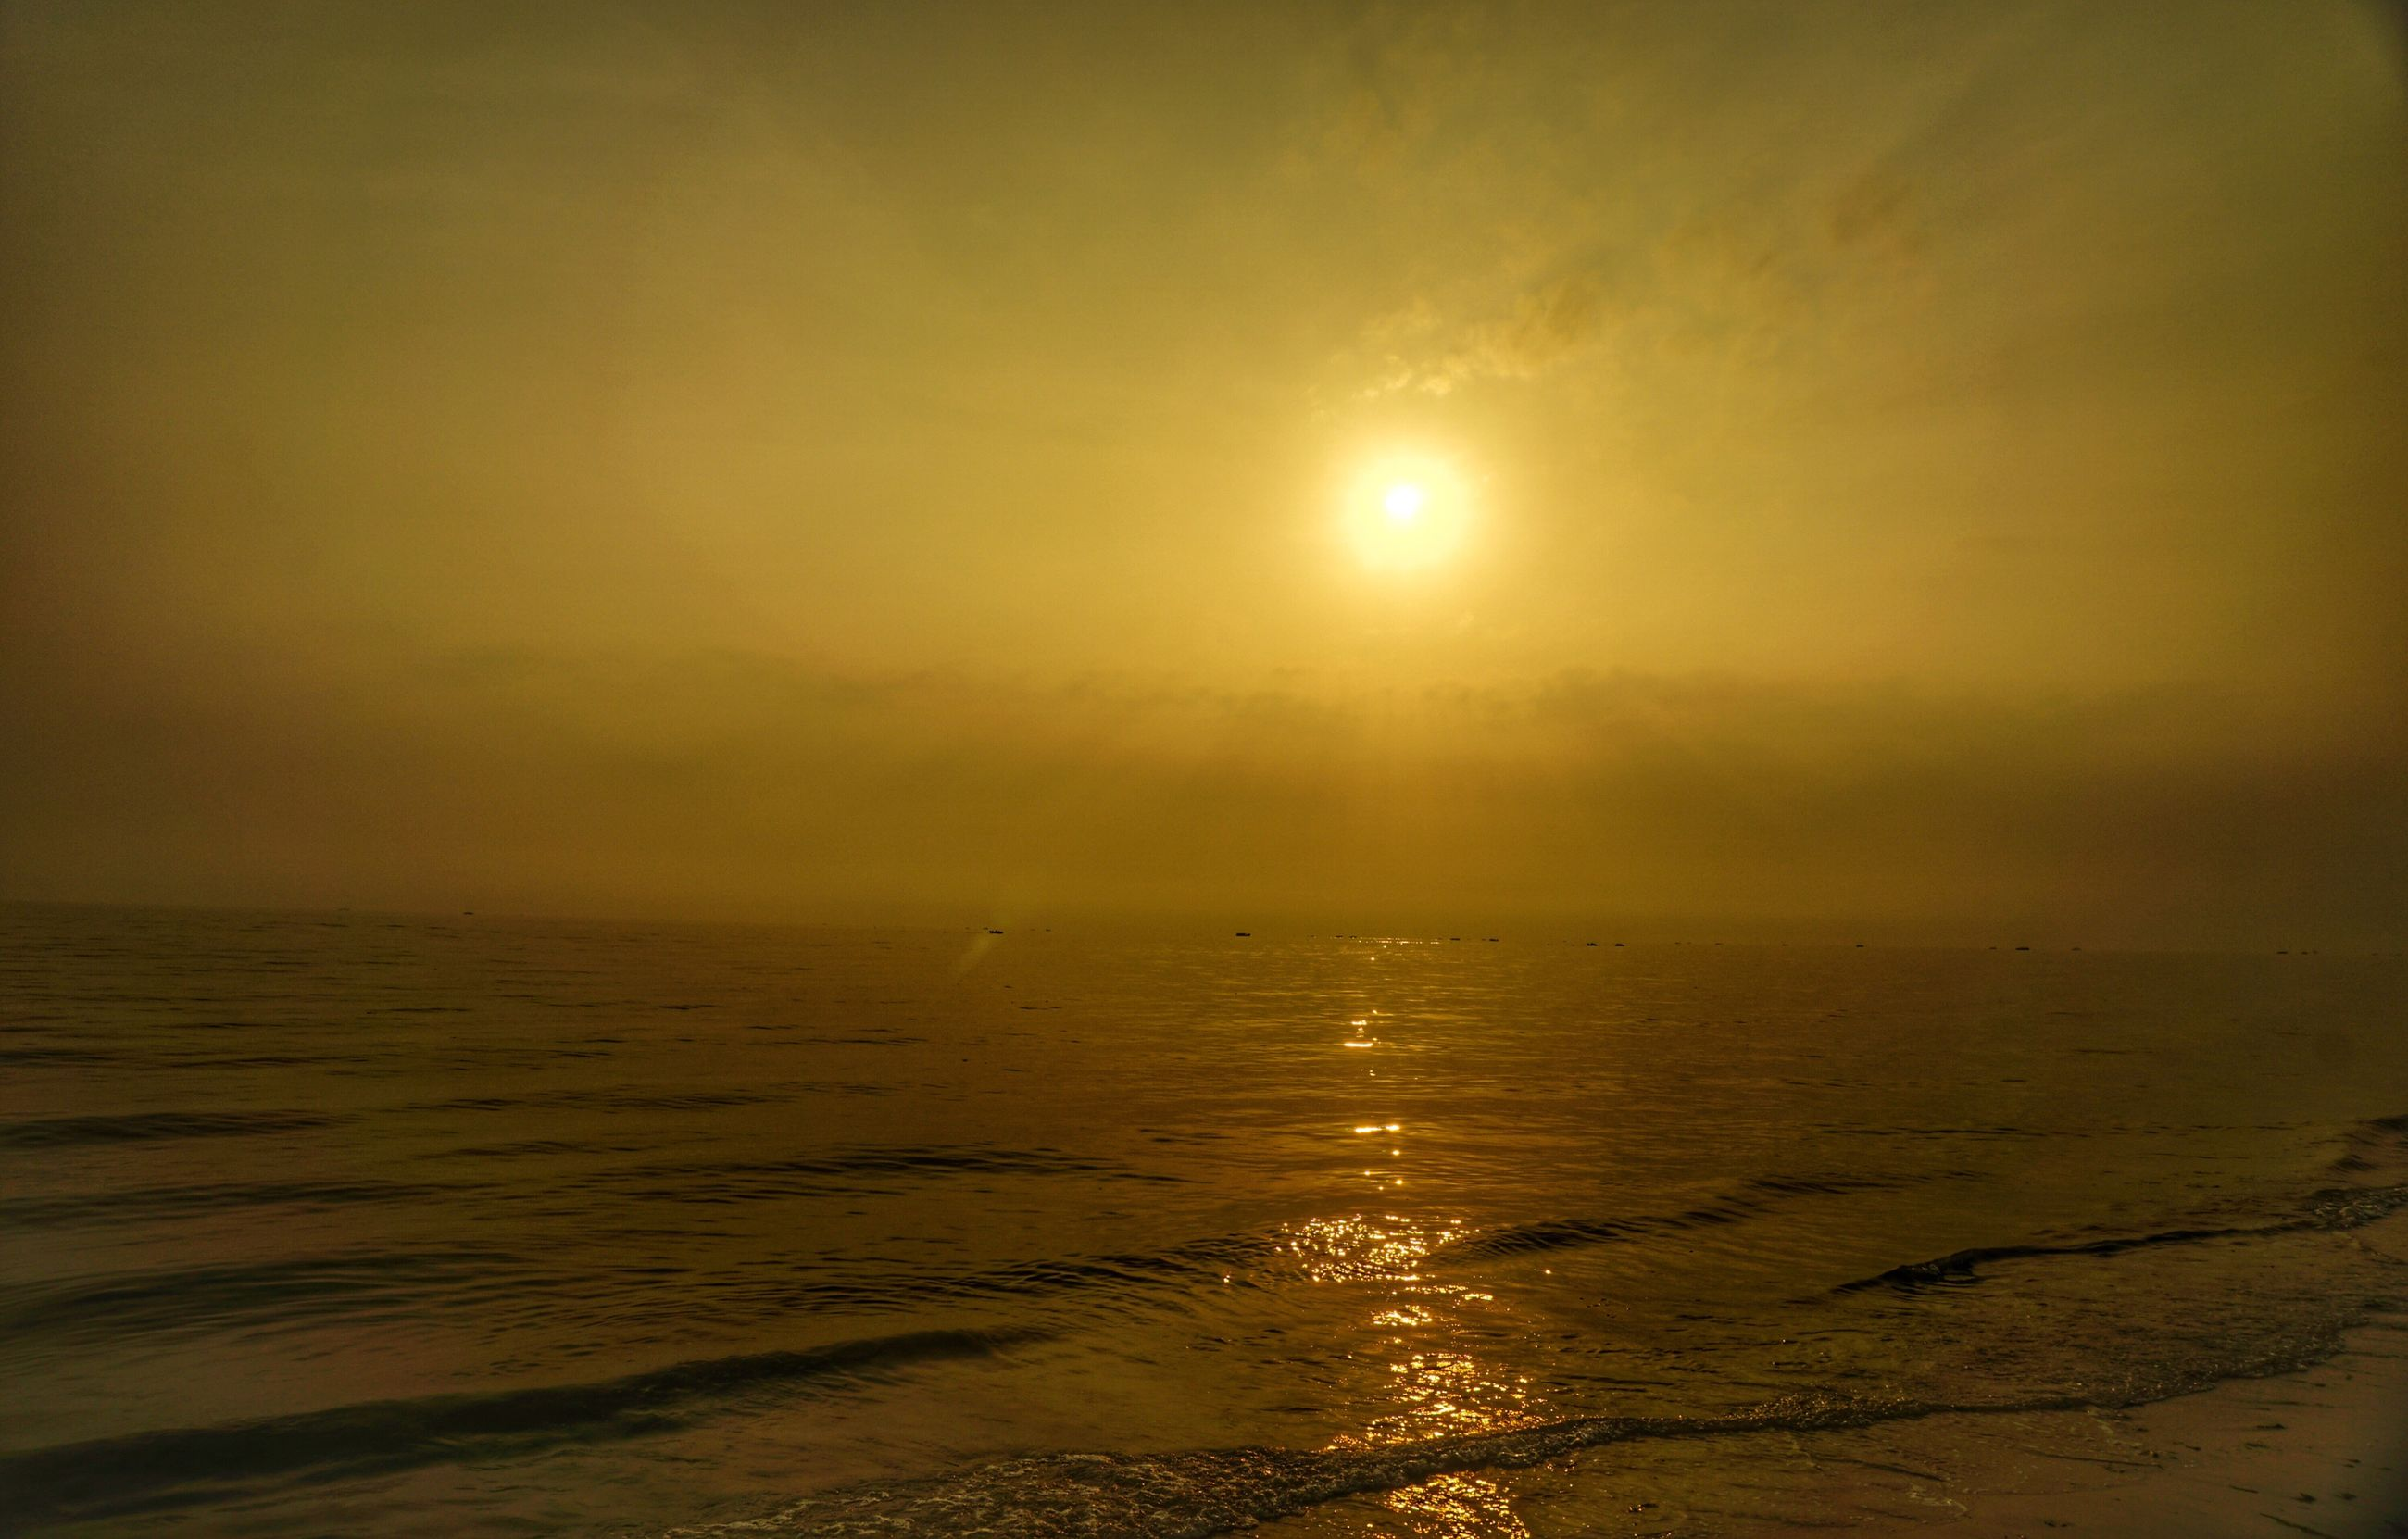 sea, water, sun, sunset, tranquil scene, scenics, horizon over water, beach, tranquility, beauty in nature, shore, nature, idyllic, sky, reflection, sand, sunlight, remote, wave, non-urban scene